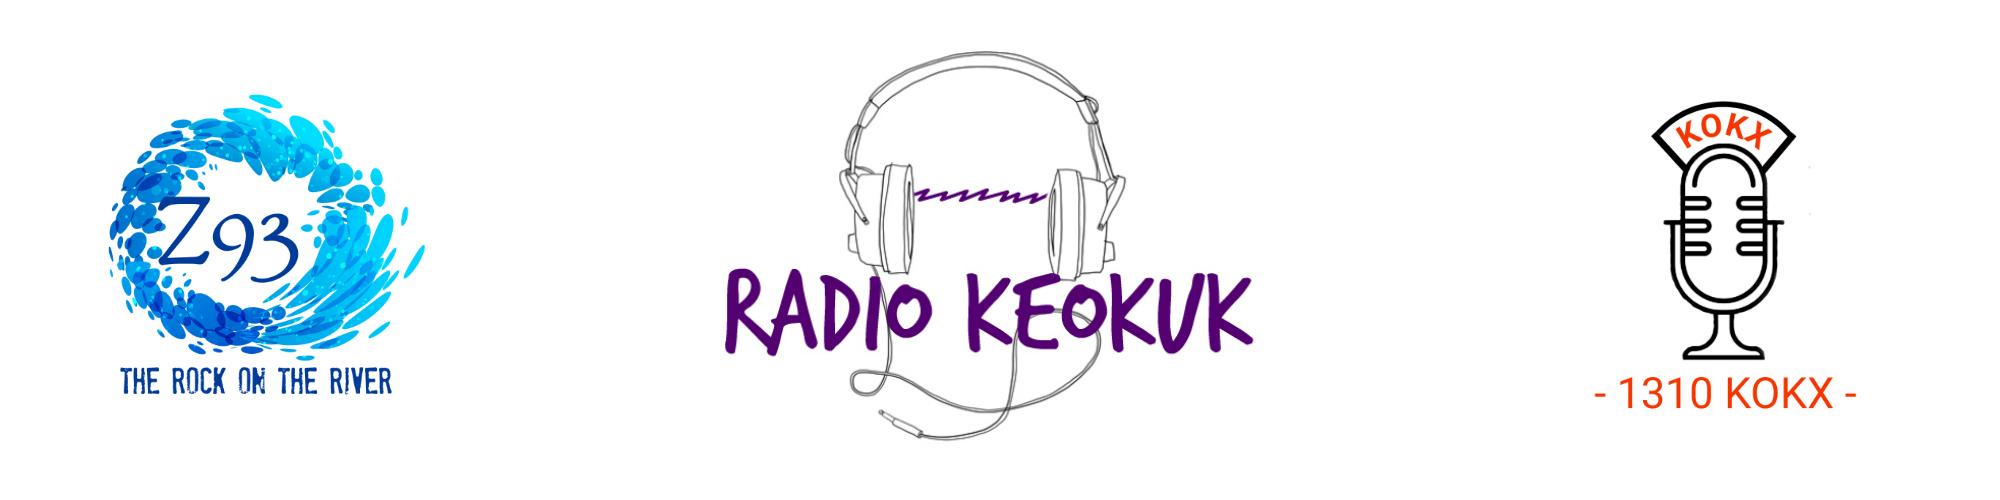 Radio Keokuk